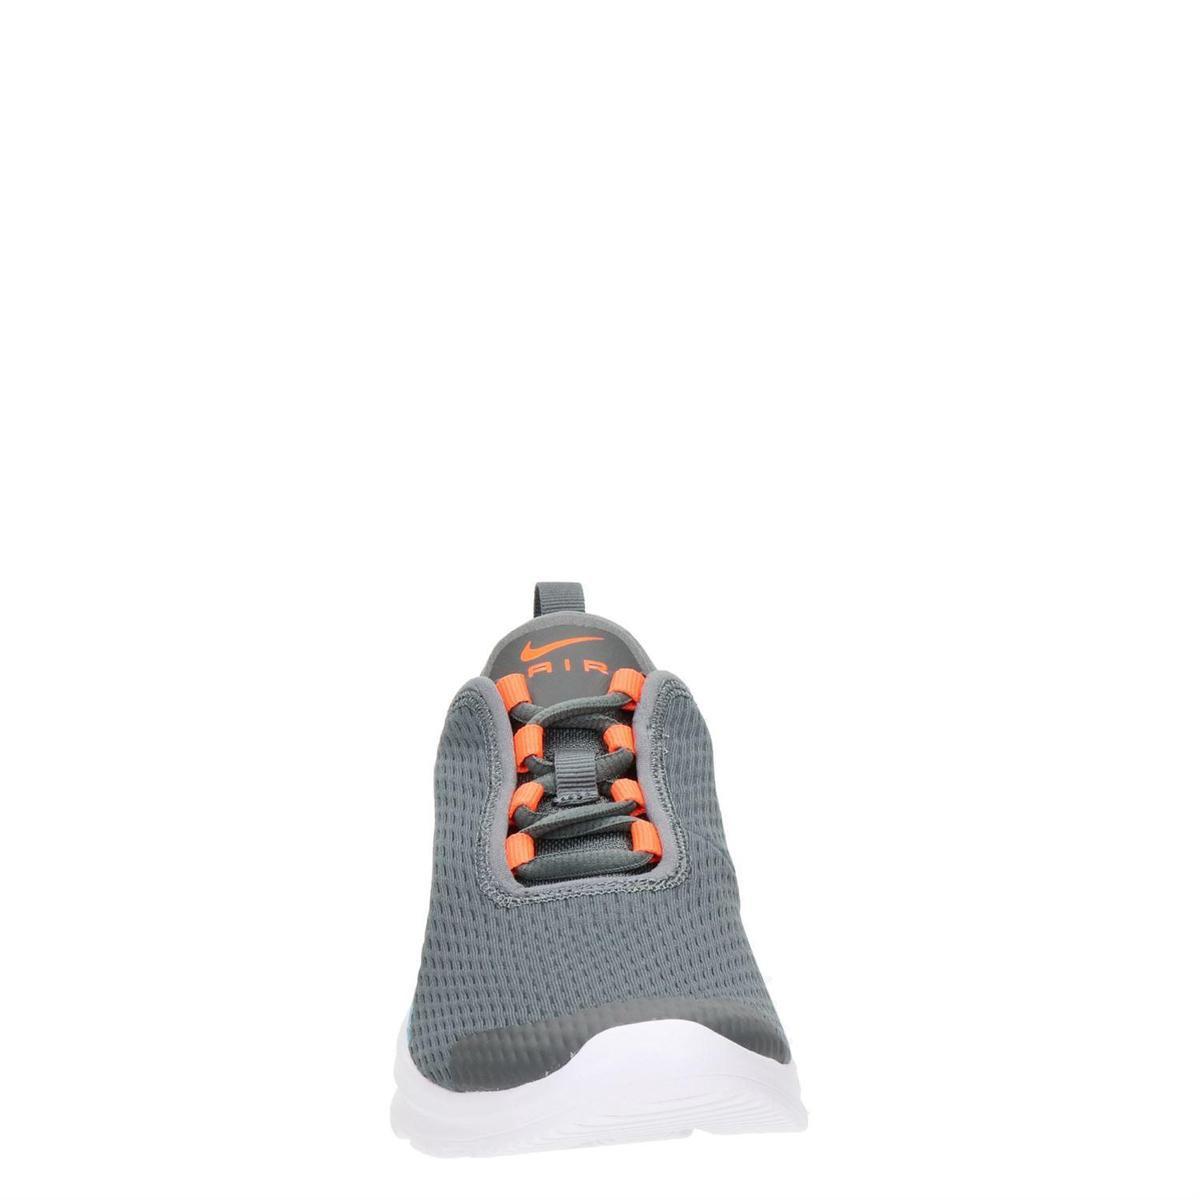 Nike Air Max Motion jongens sneaker Antraciet Maat 39